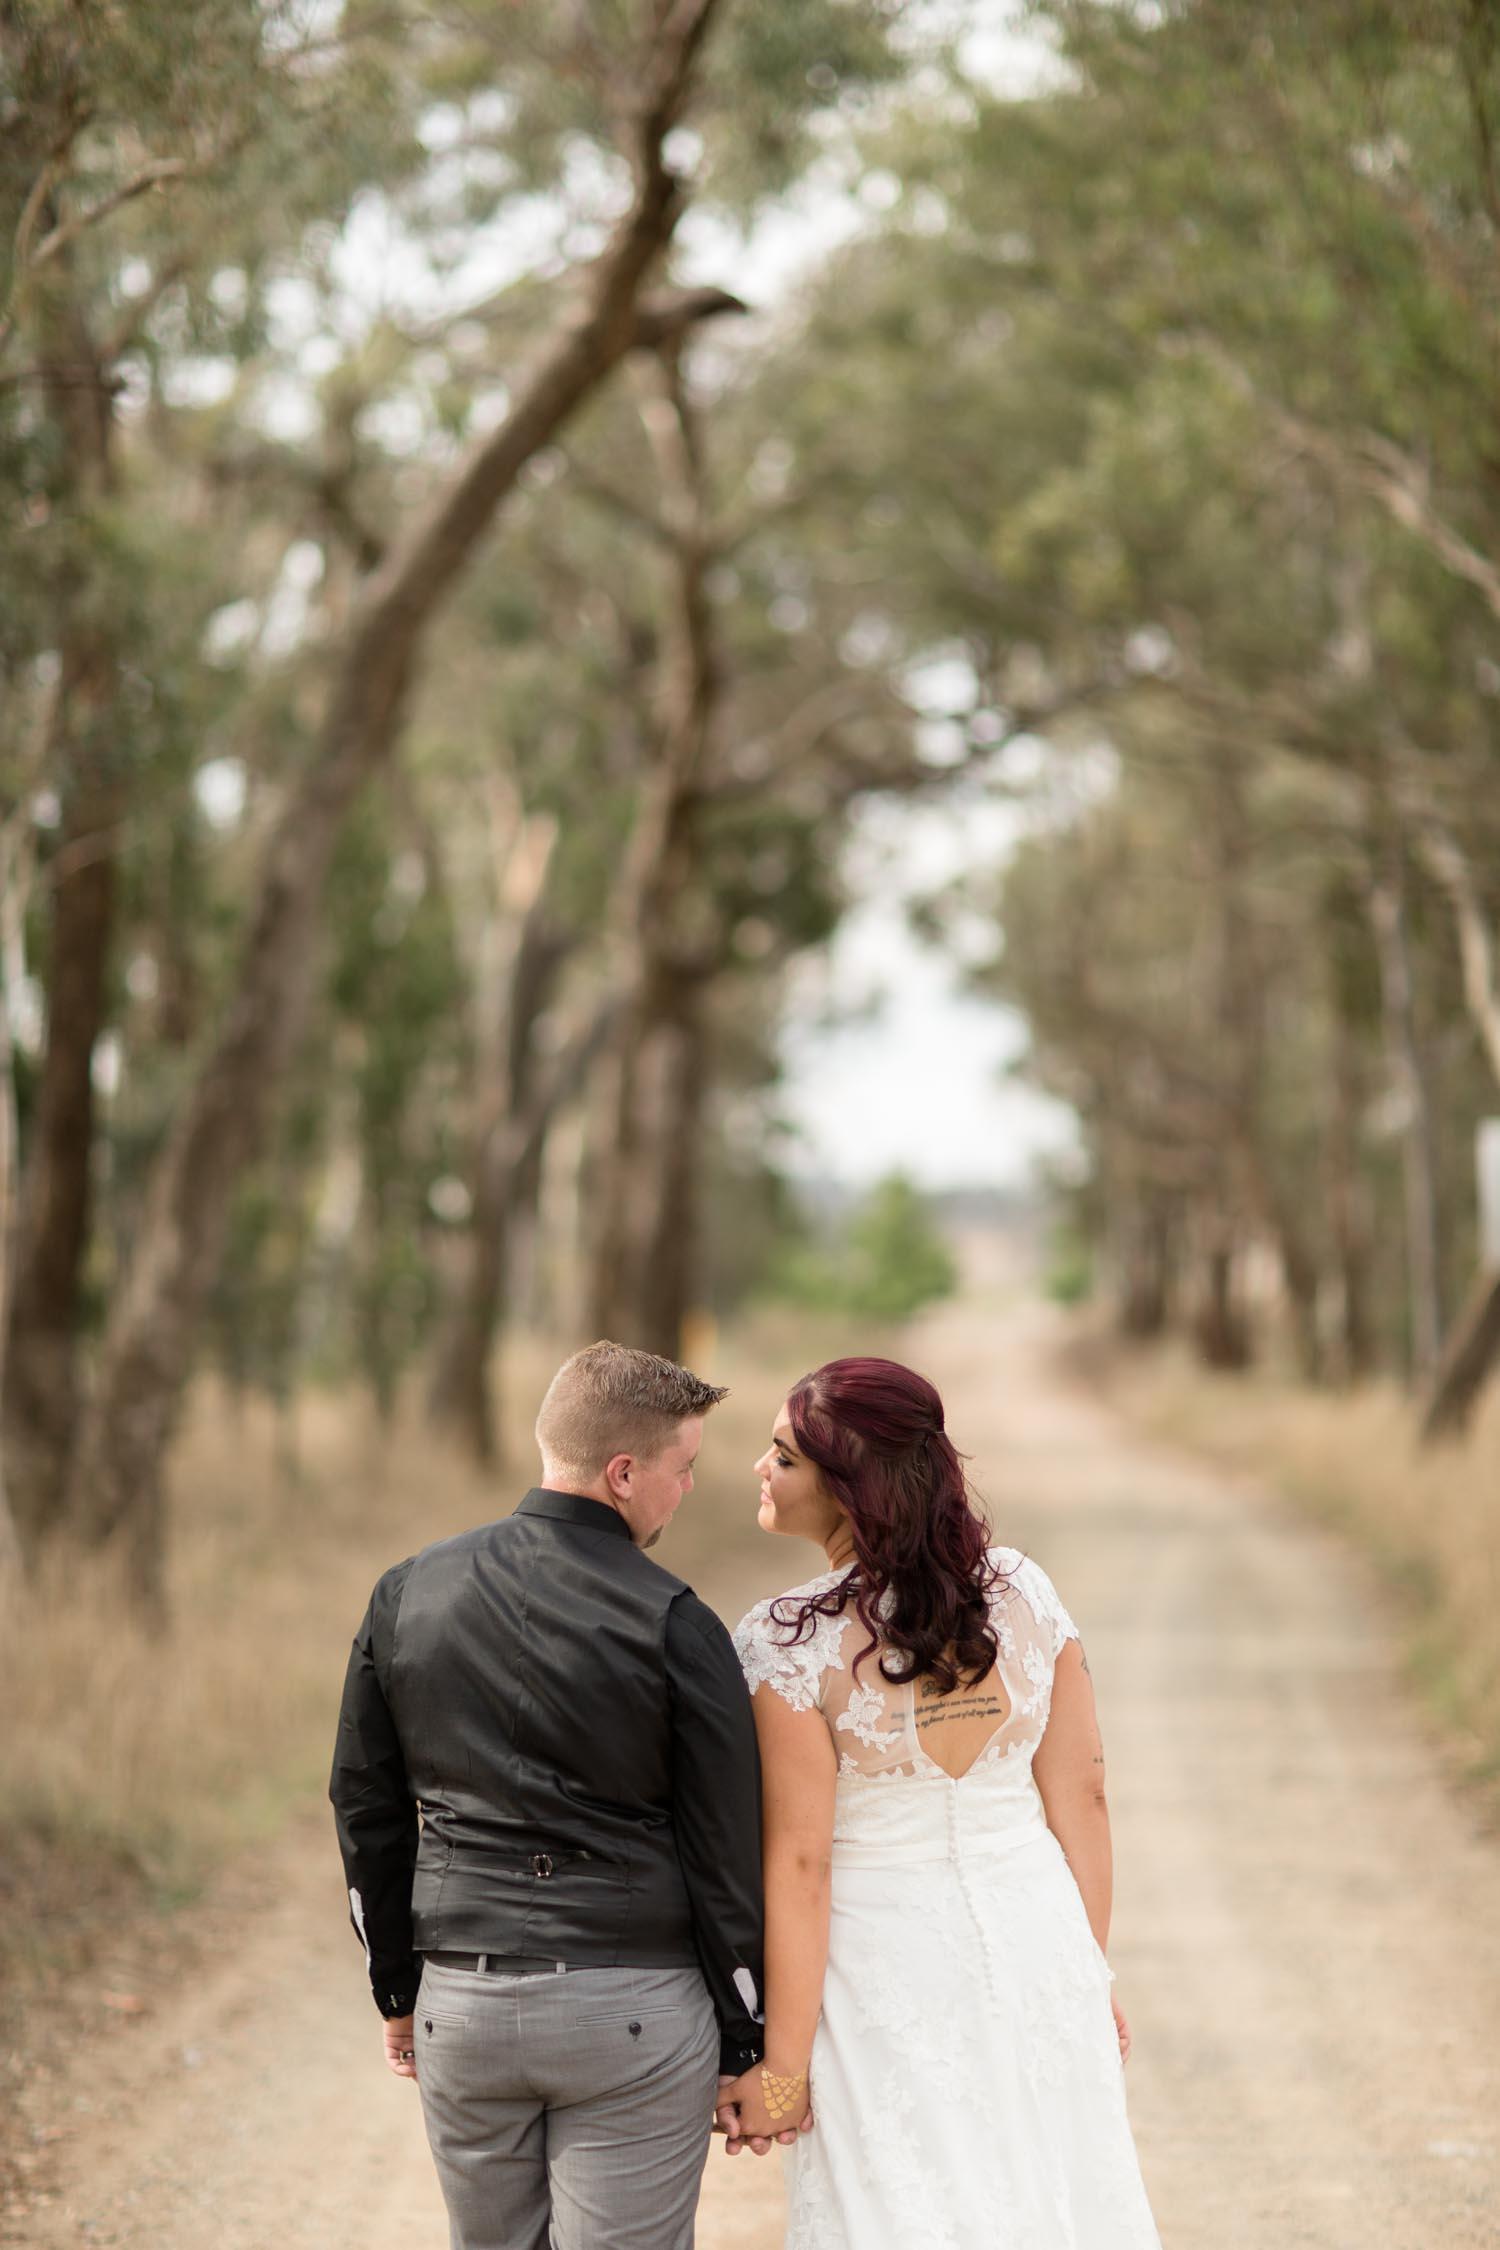 150307-Wedding-TOWN-5-296.jpg